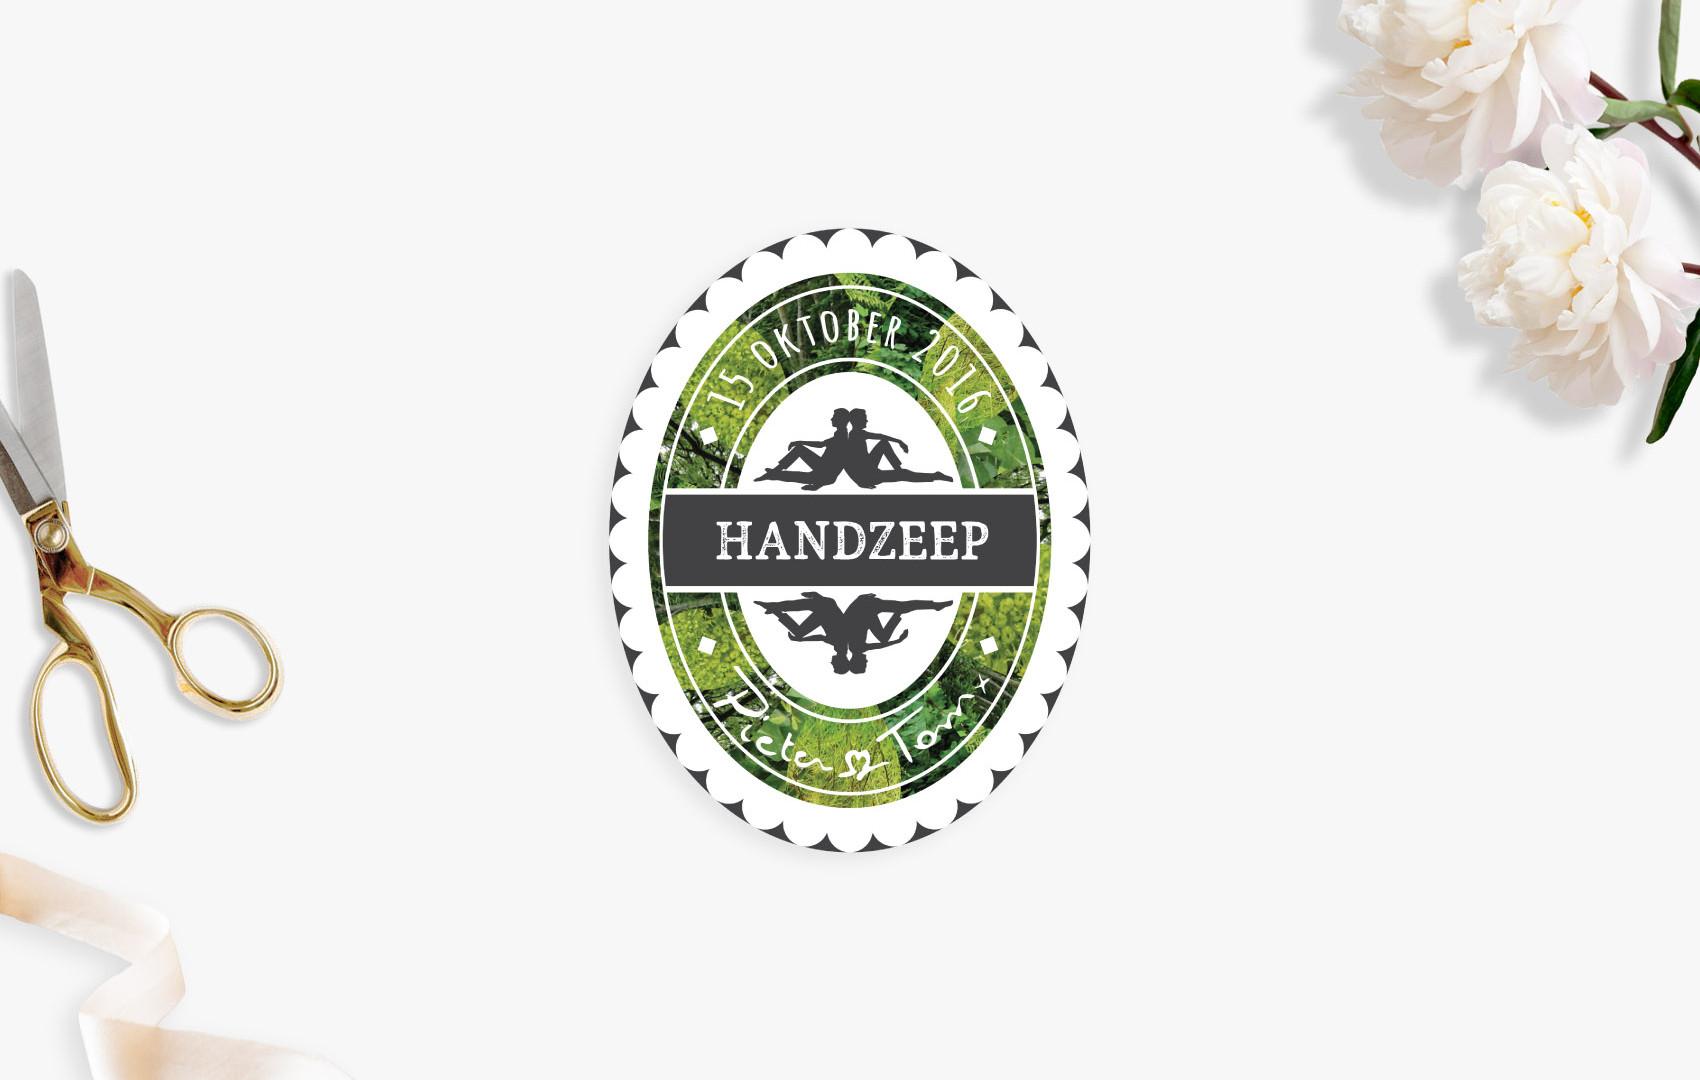 Hand Soap Label